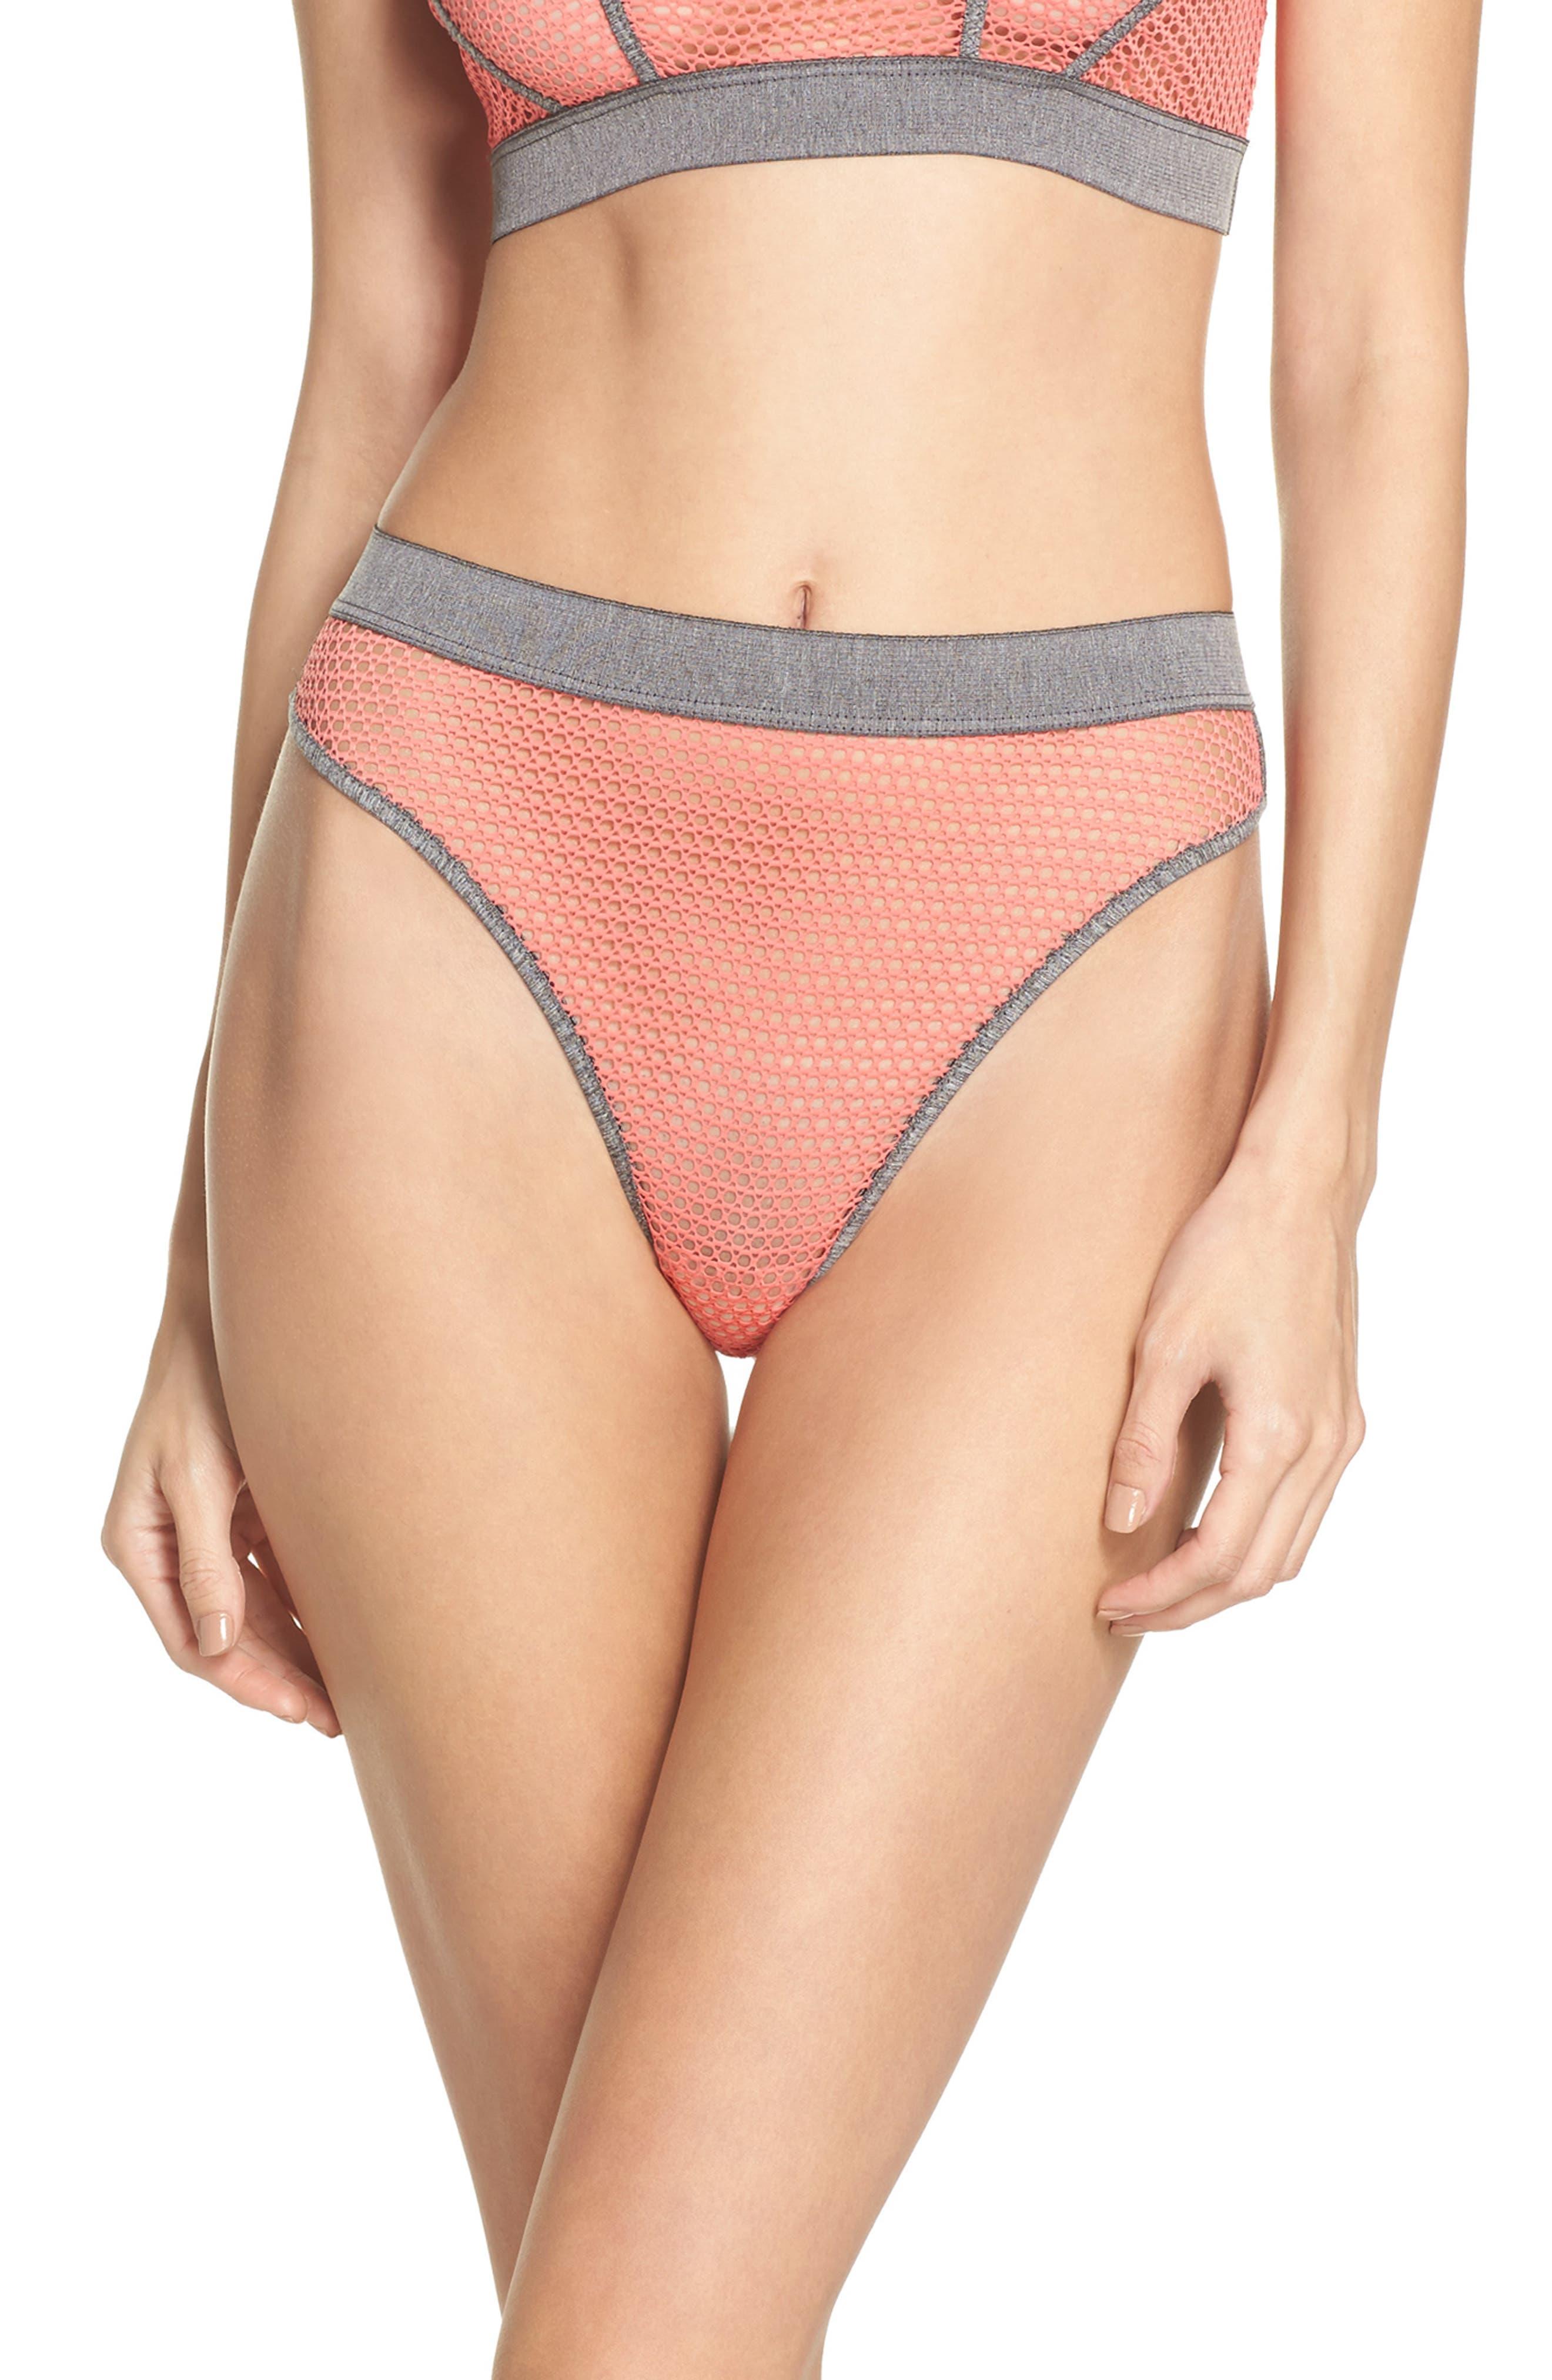 Myah High Leg Bikini,                             Main thumbnail 1, color,                             Moroccan Rose/ Heath Gray